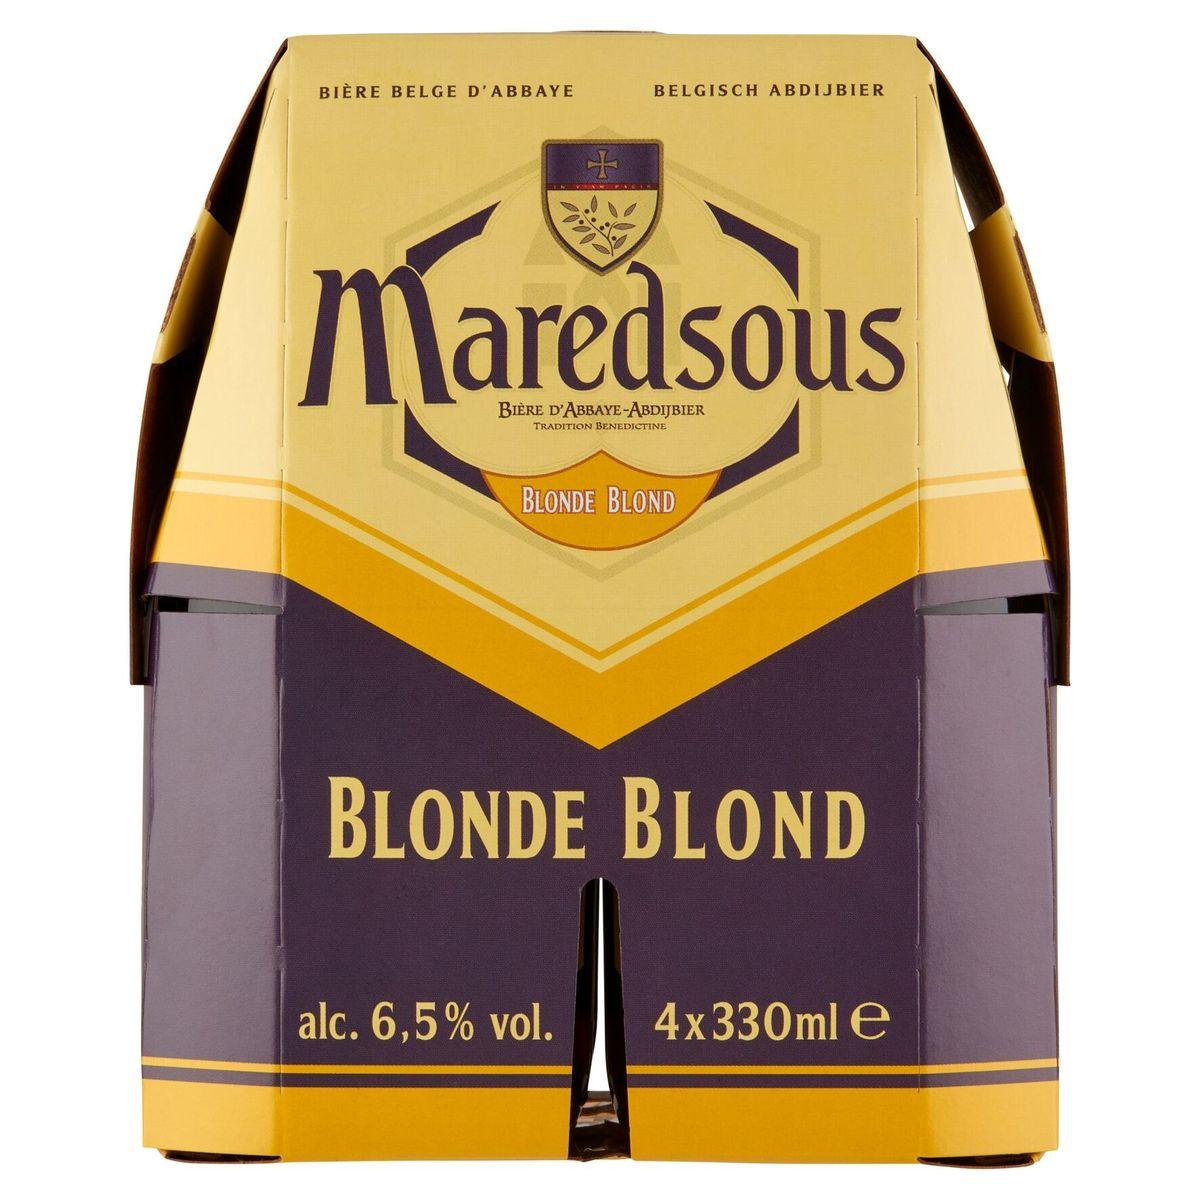 Maredsous Belgisch Abdijbier Blond 4 x 330 ml